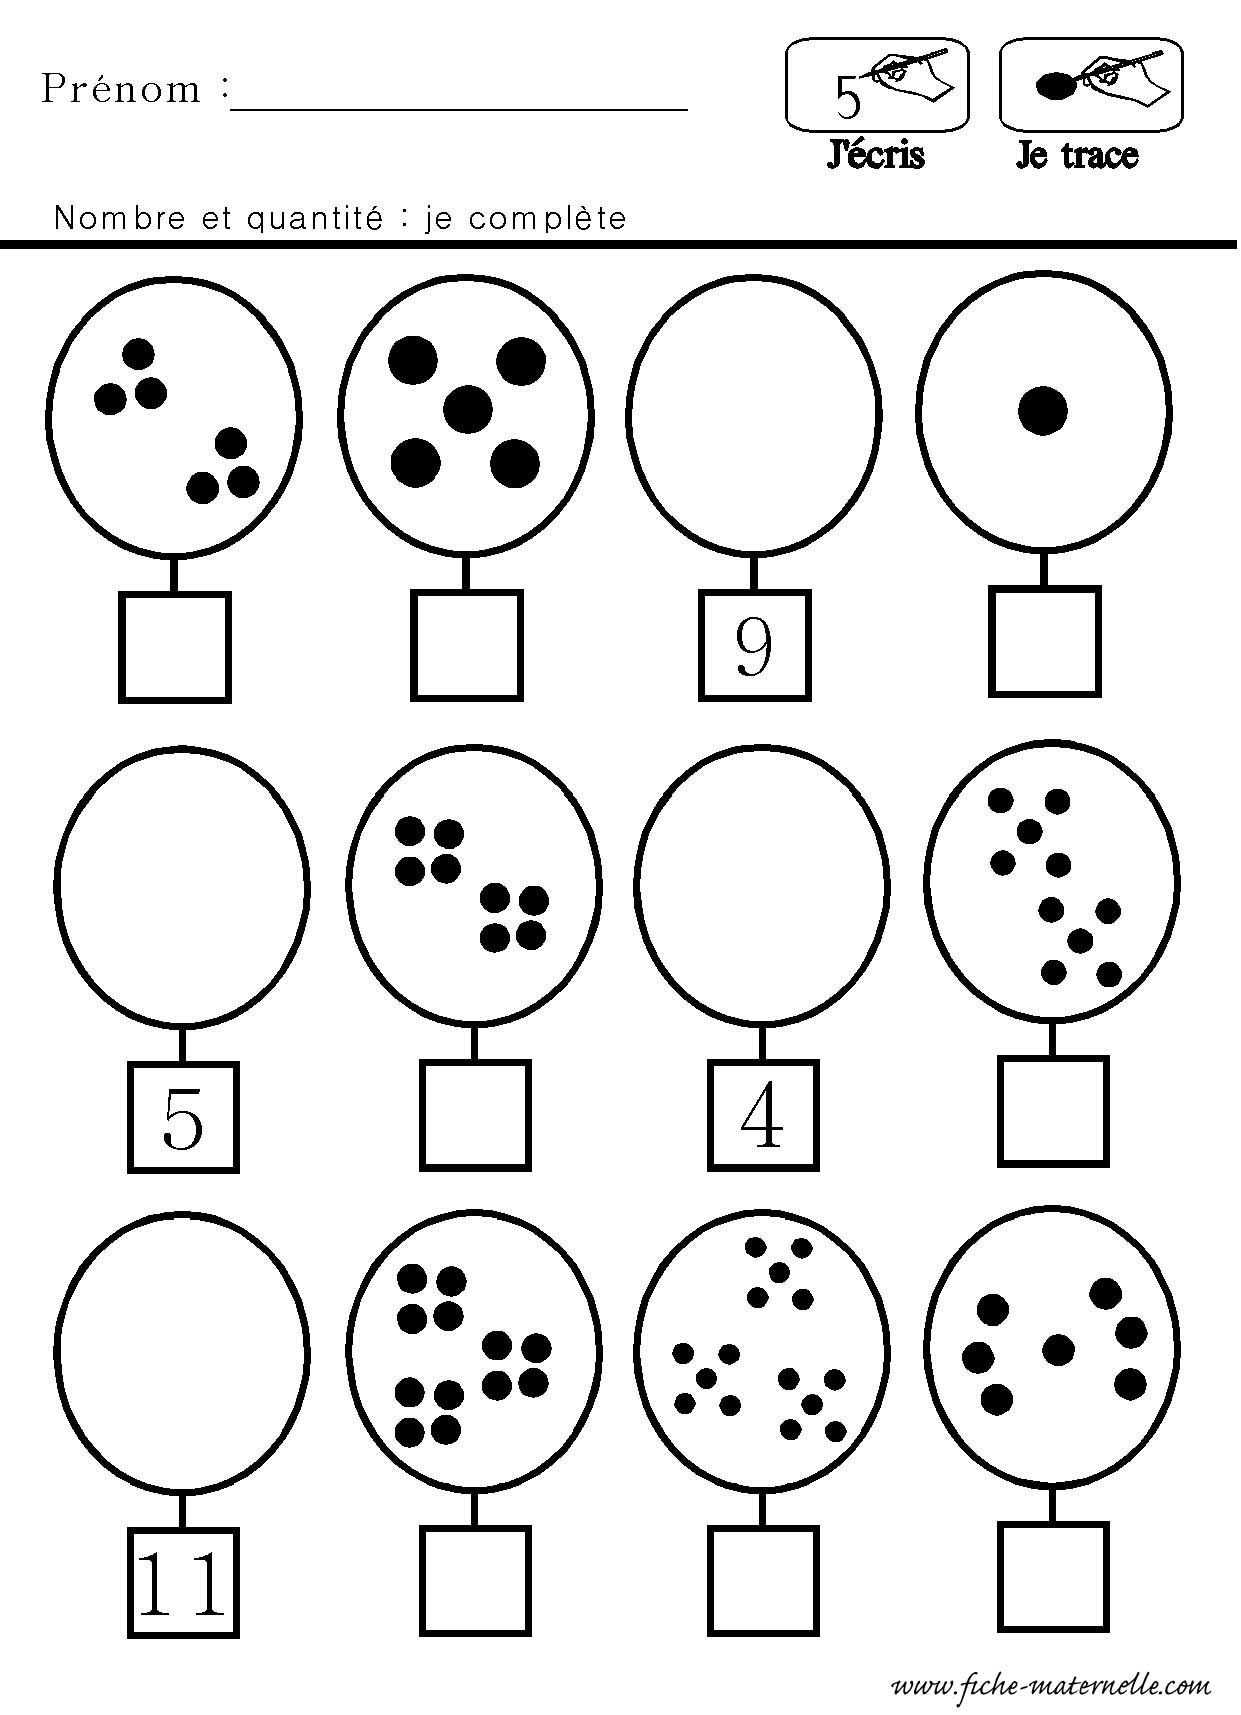 Épinglé sur Matematik için